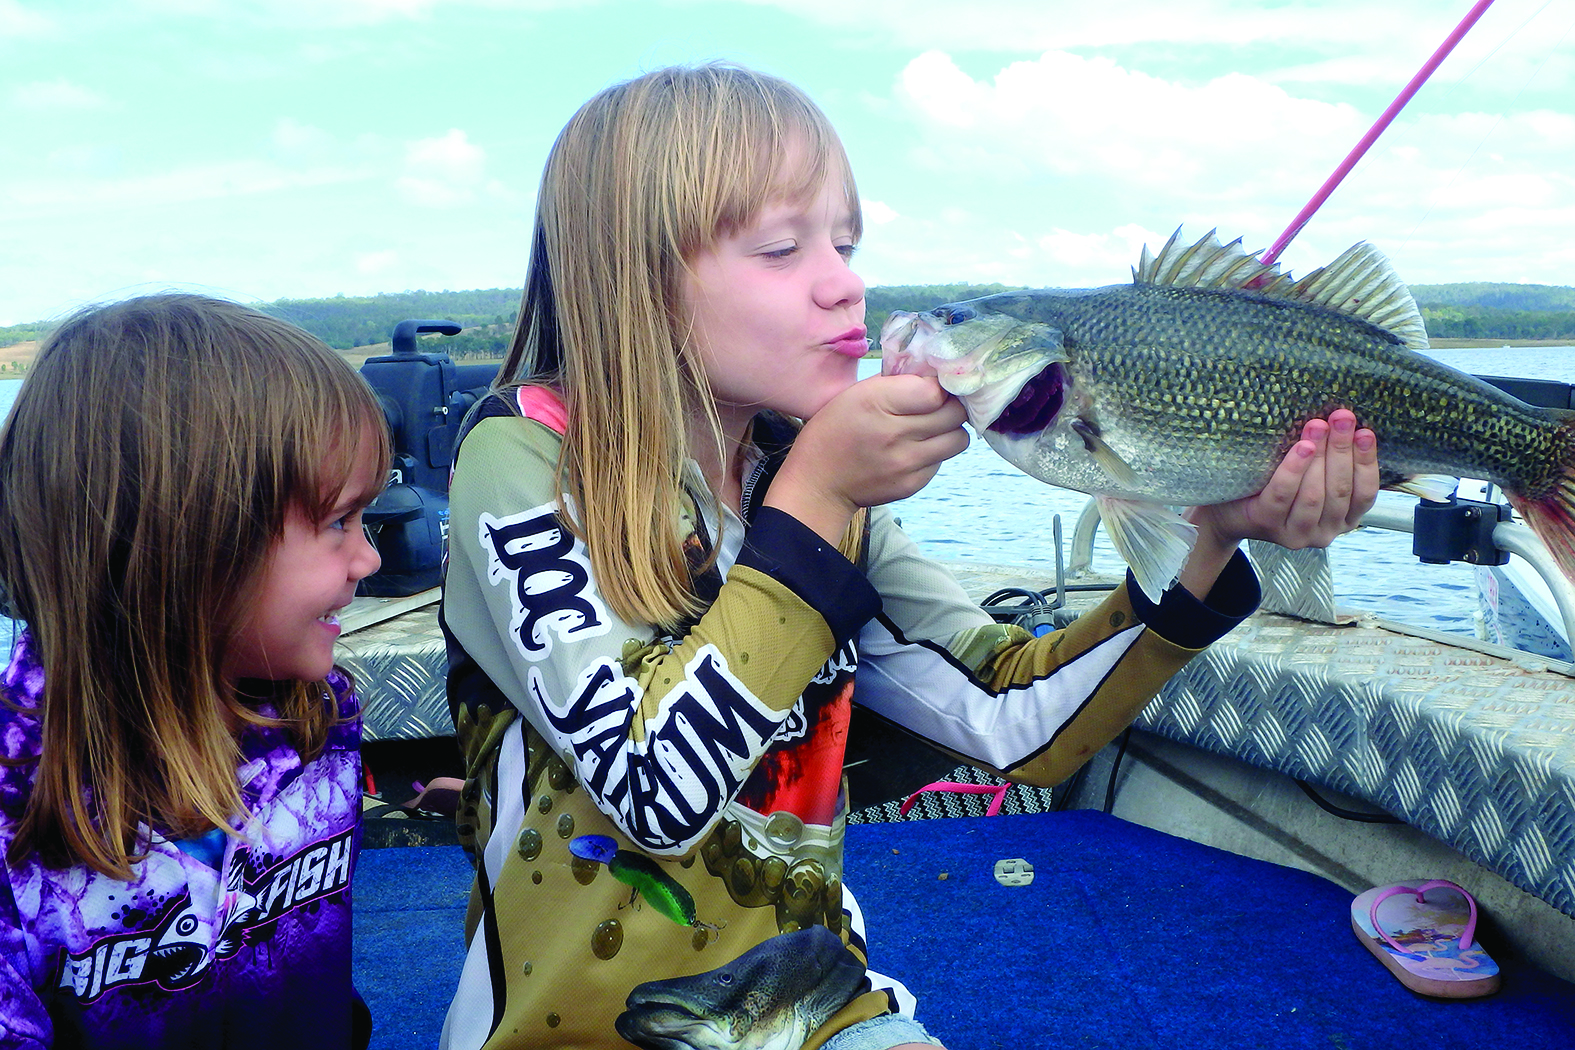 Caitlyn Bryant the fish kisser.